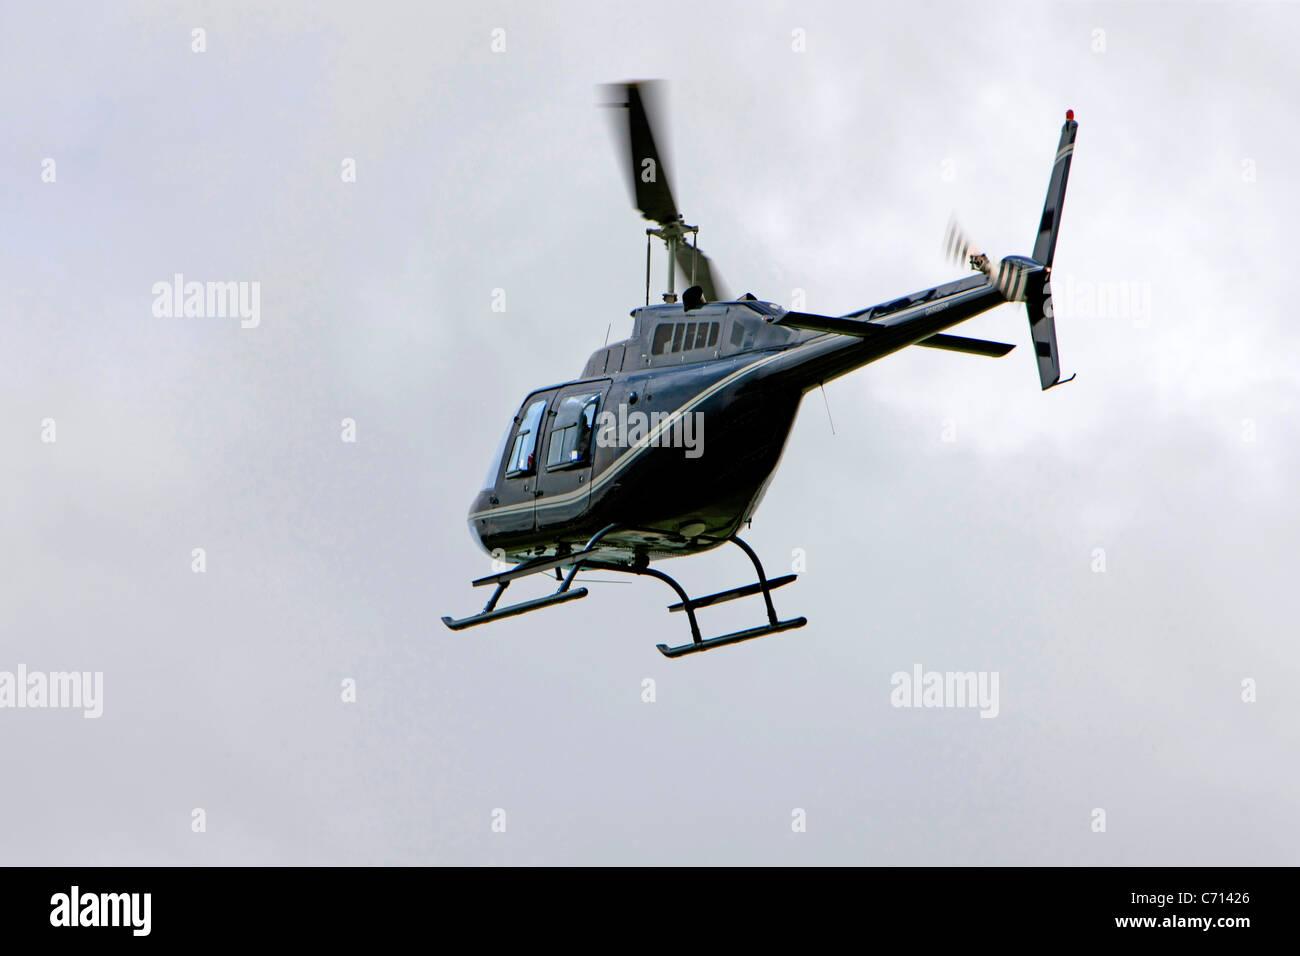 Elicottero Jet Ranger : Un bell jetranger iii elicottero foto immagine stock